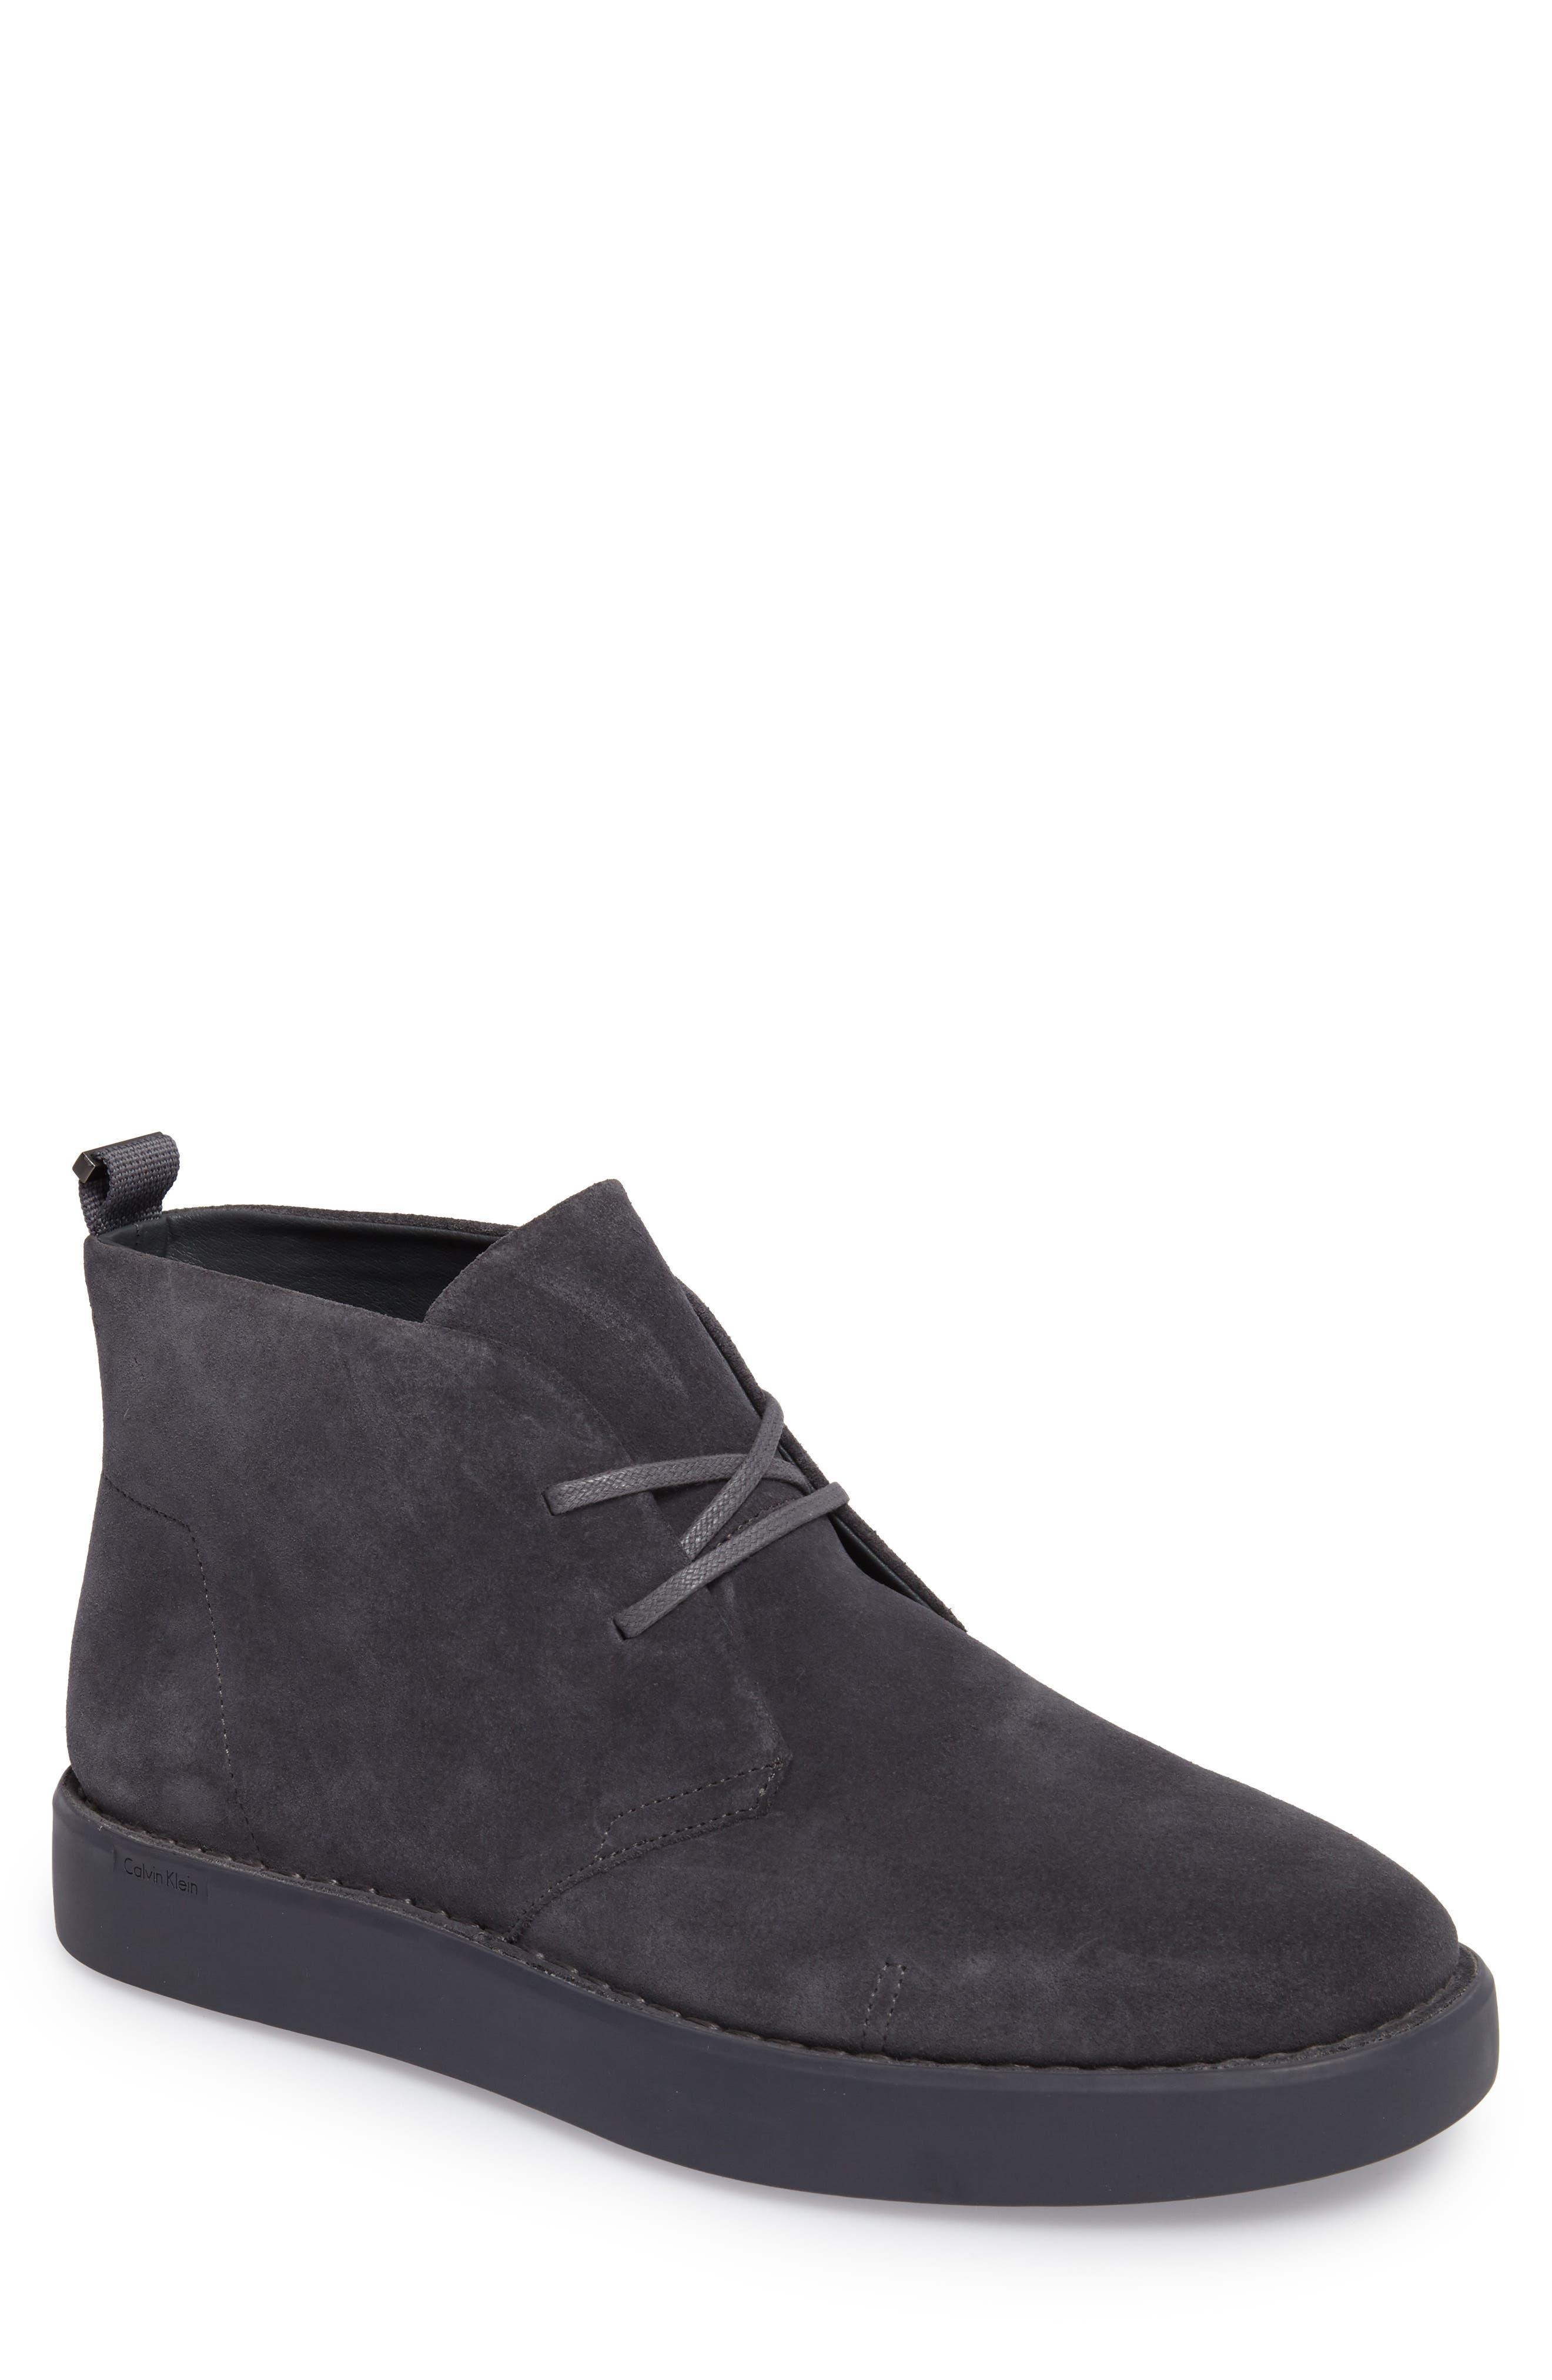 Alternate Image 1 Selected - Calvin Klein Galway Chukka Boot (Men)